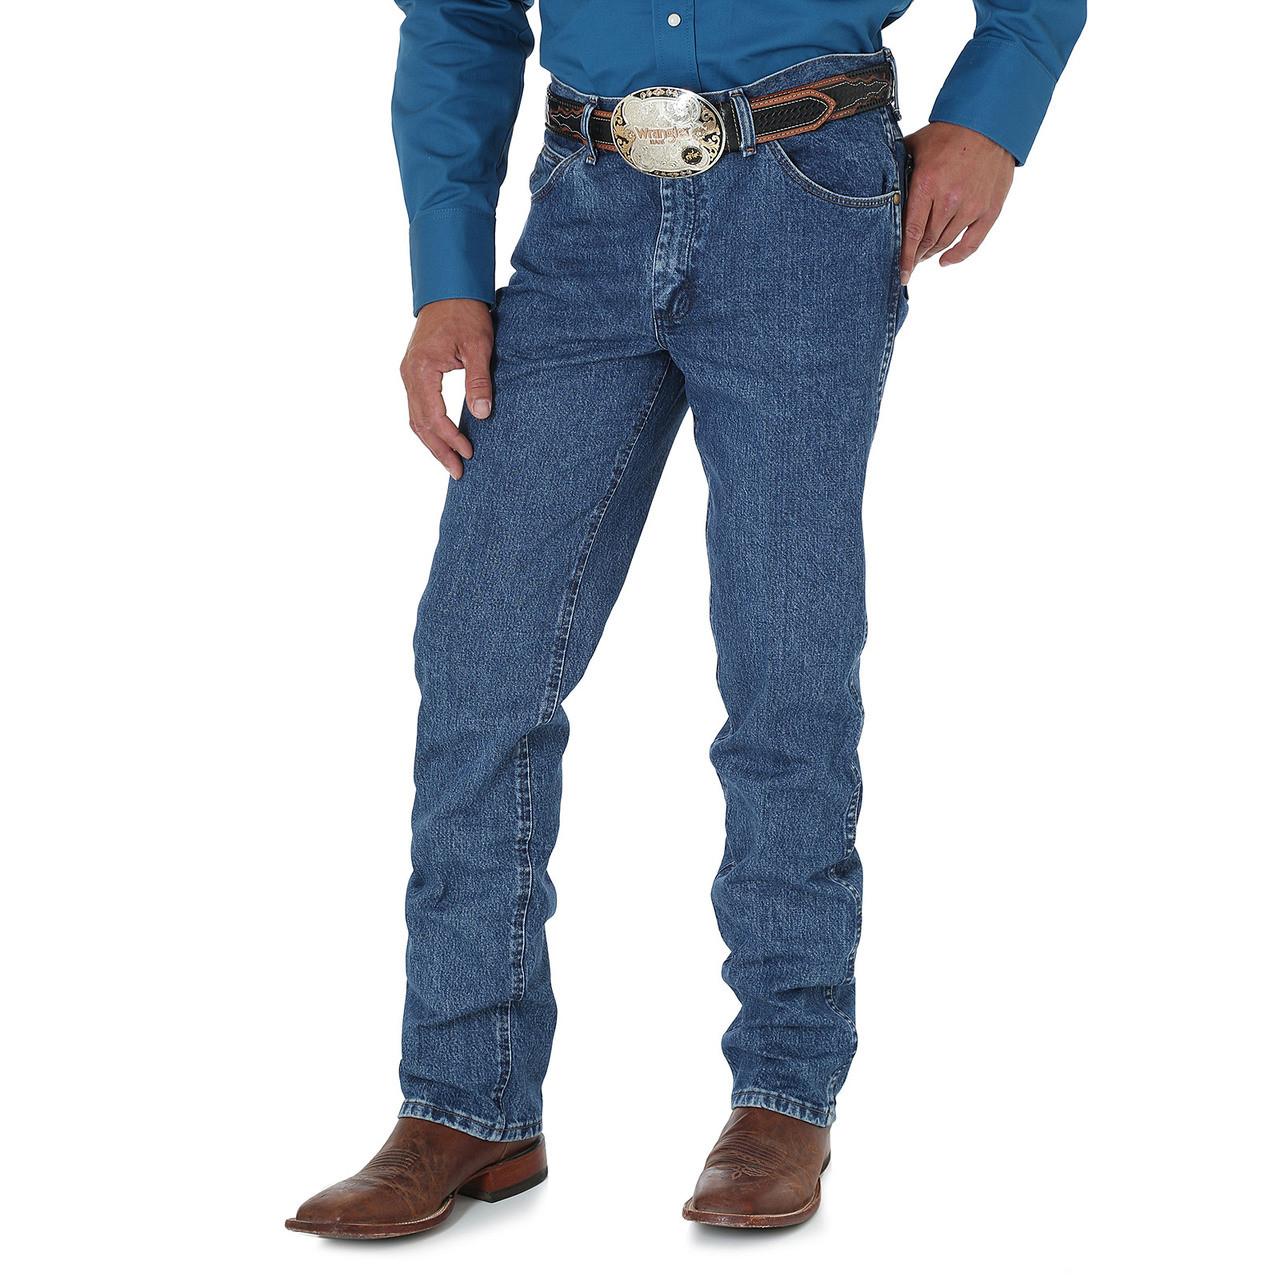 105063cb ... Wrangler Premium Performance Cowboy Cut Slim Fit Jean - Dark Stone.  Image 1